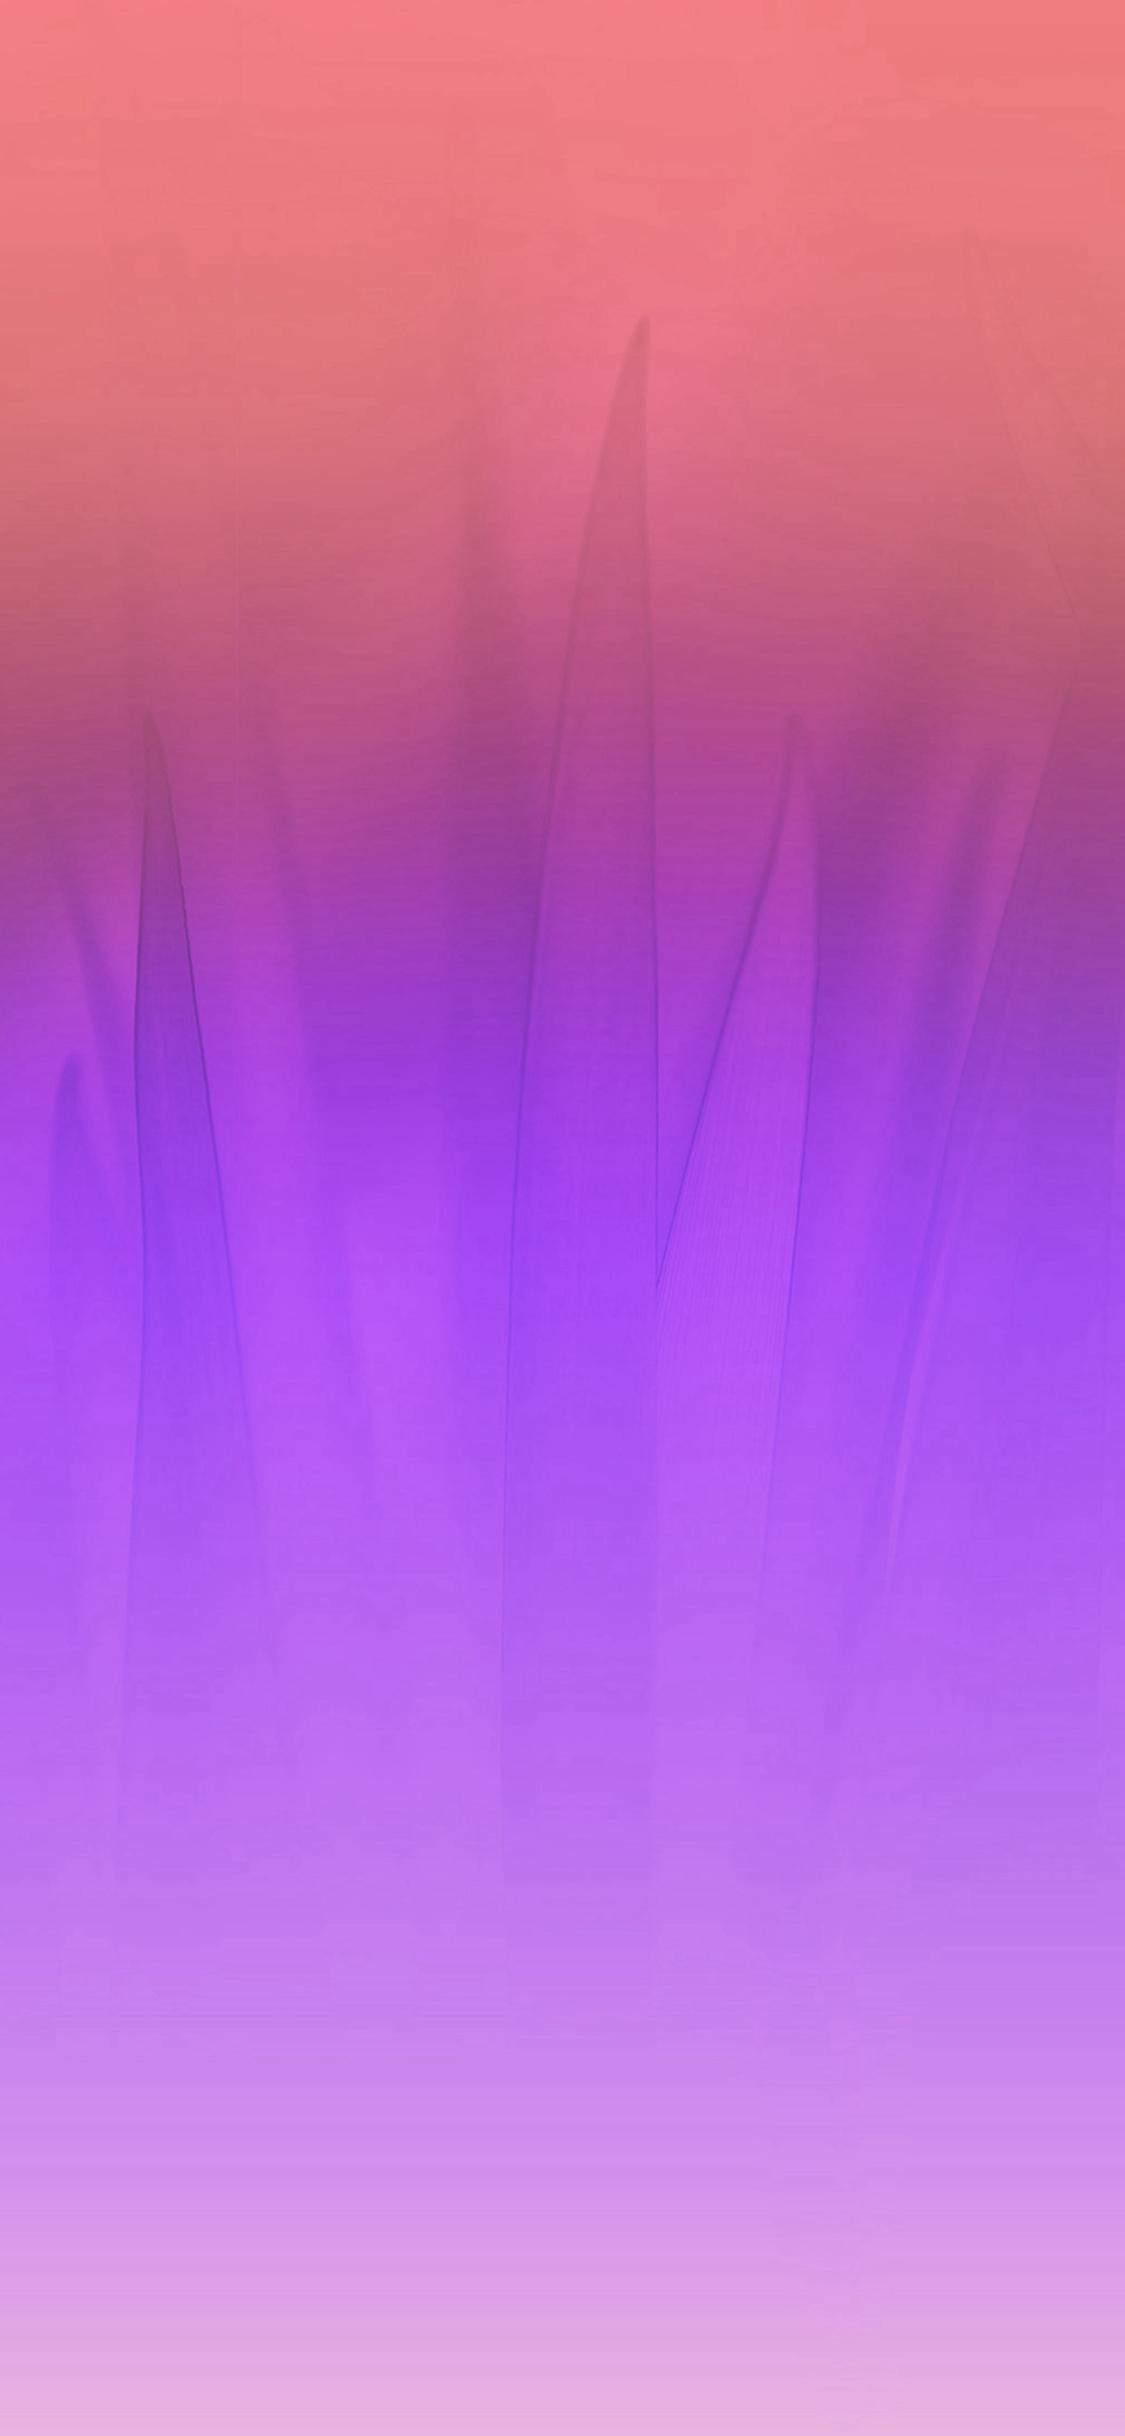 Soft Blue Nature Purple Pink Leaf Pattern Iphone X